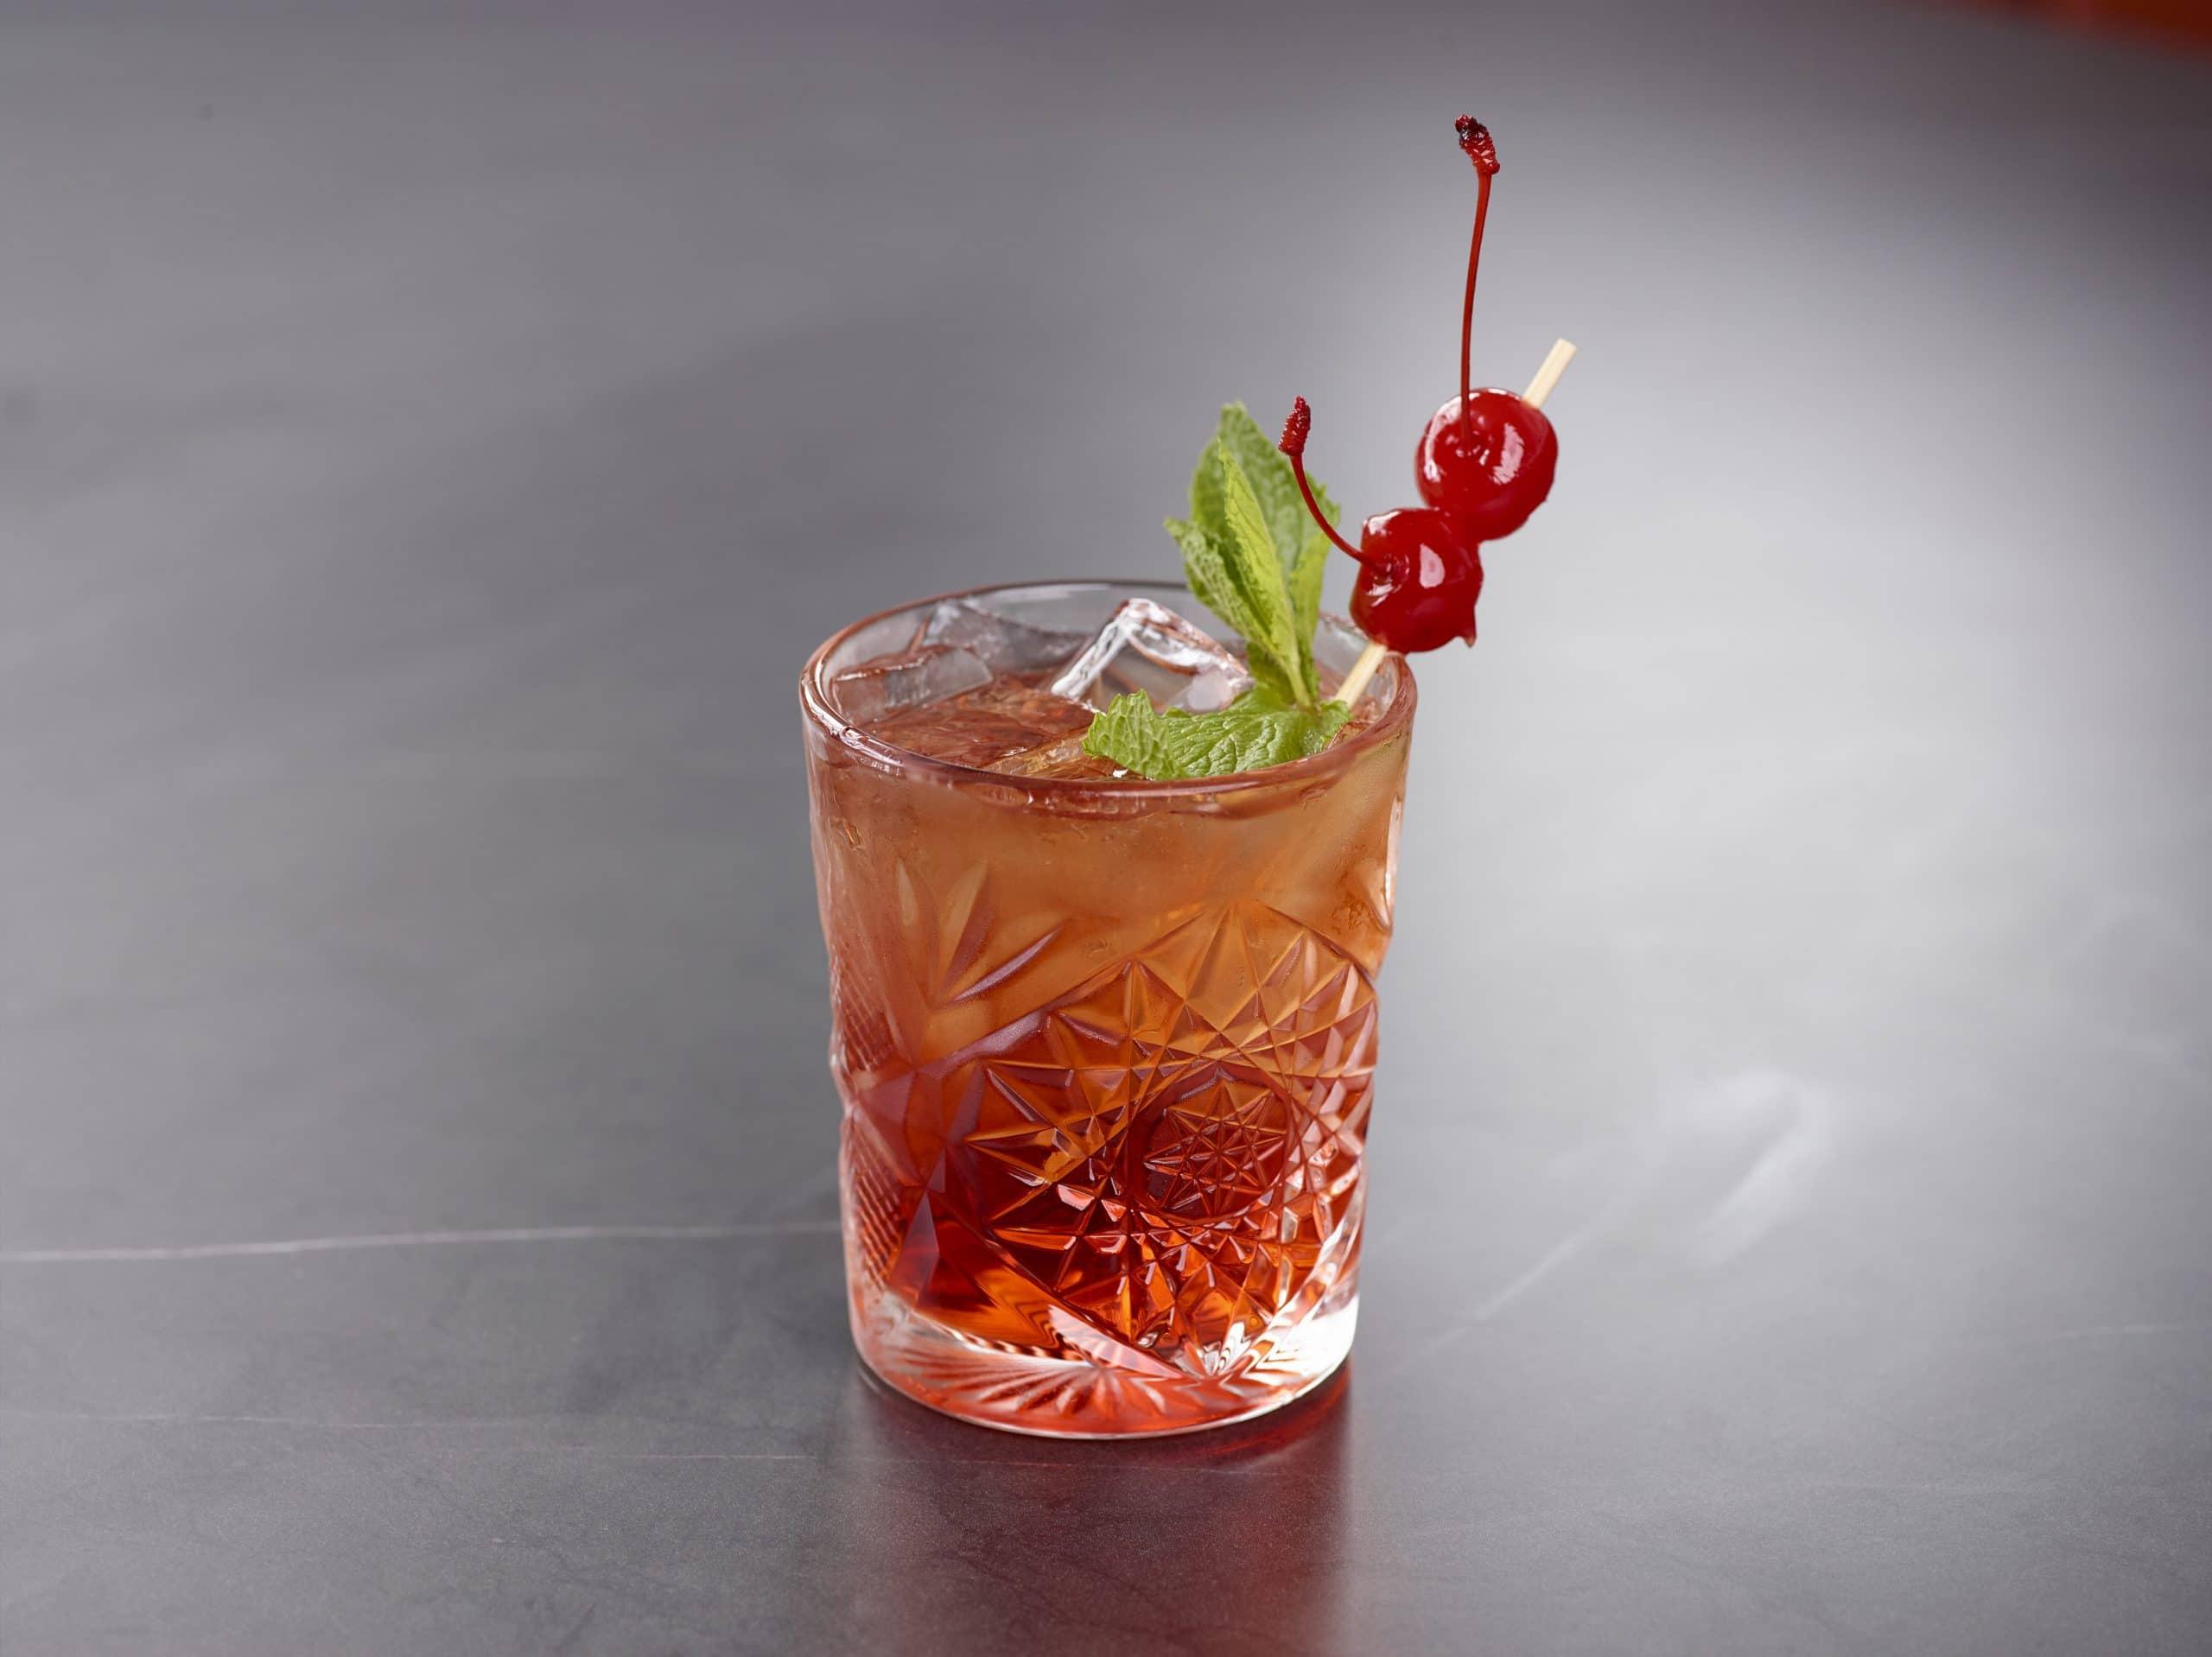 Cocktail - Saros Bar & Dining in Moonee Ponds